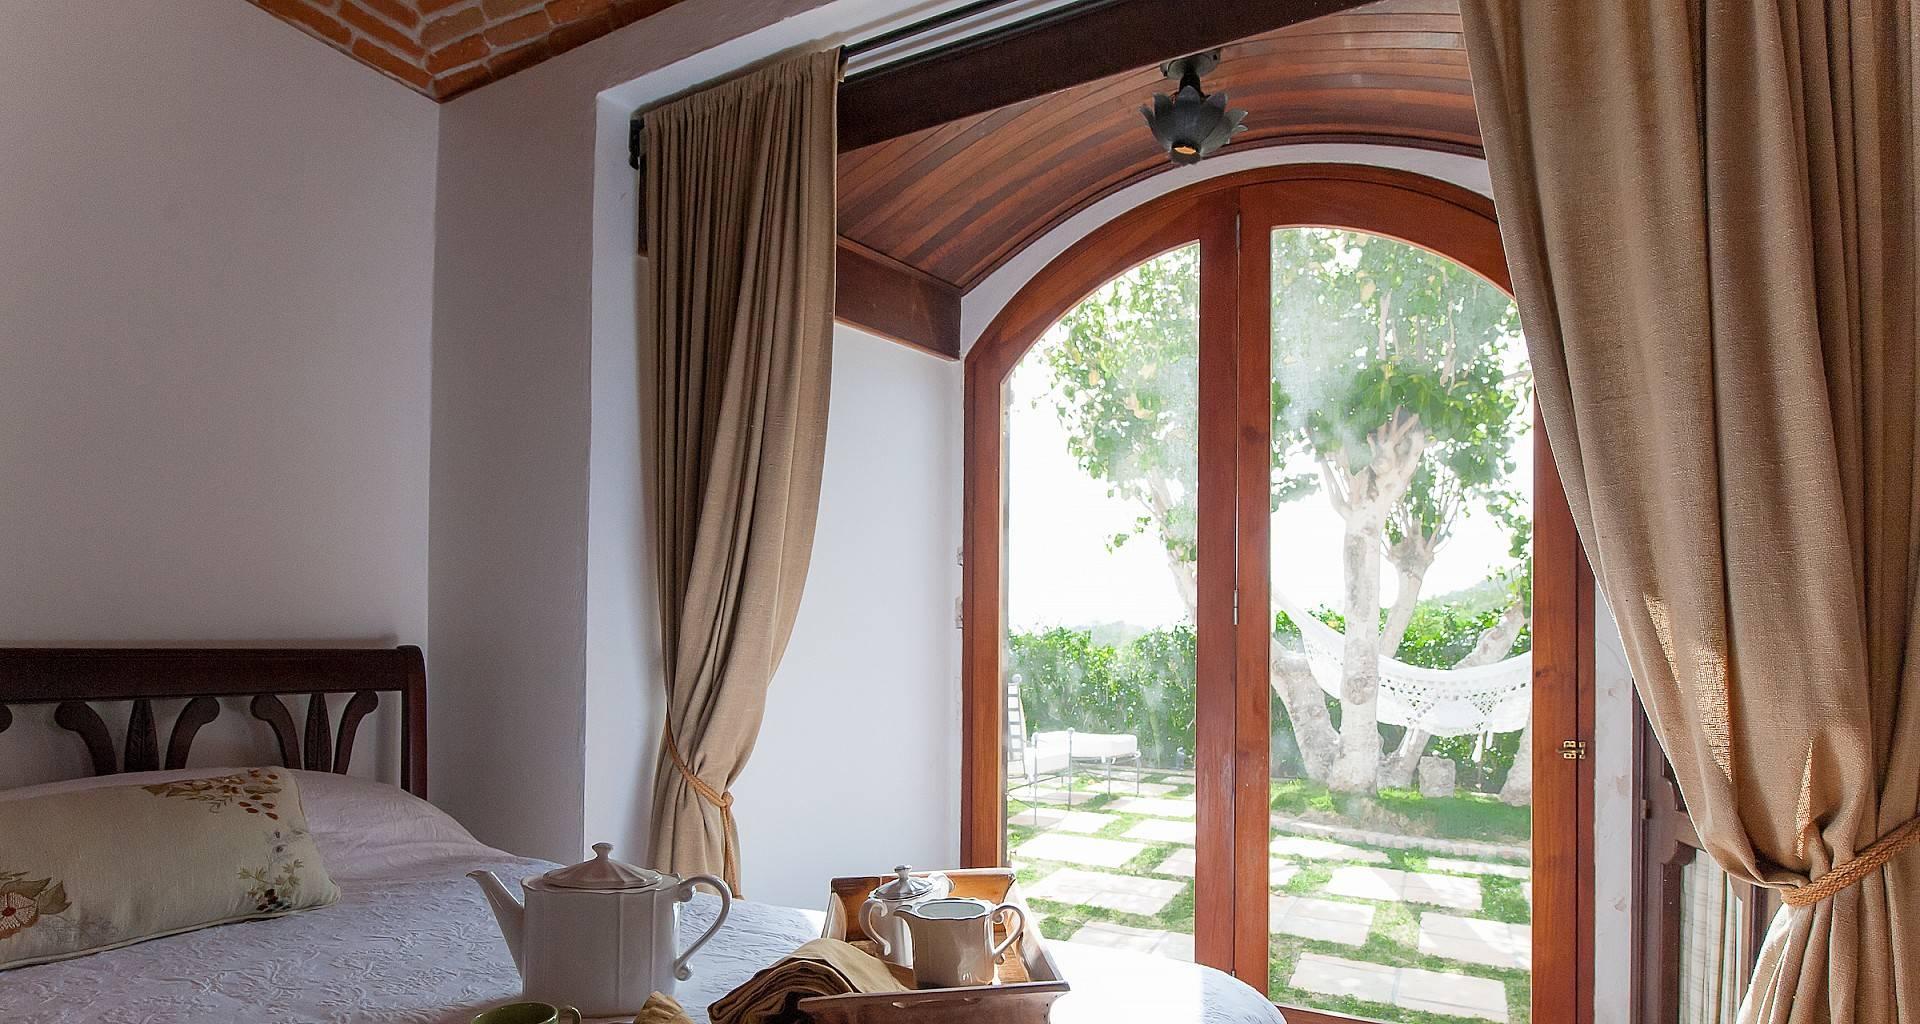 Villa Maison Mexicaine Bedroom 2